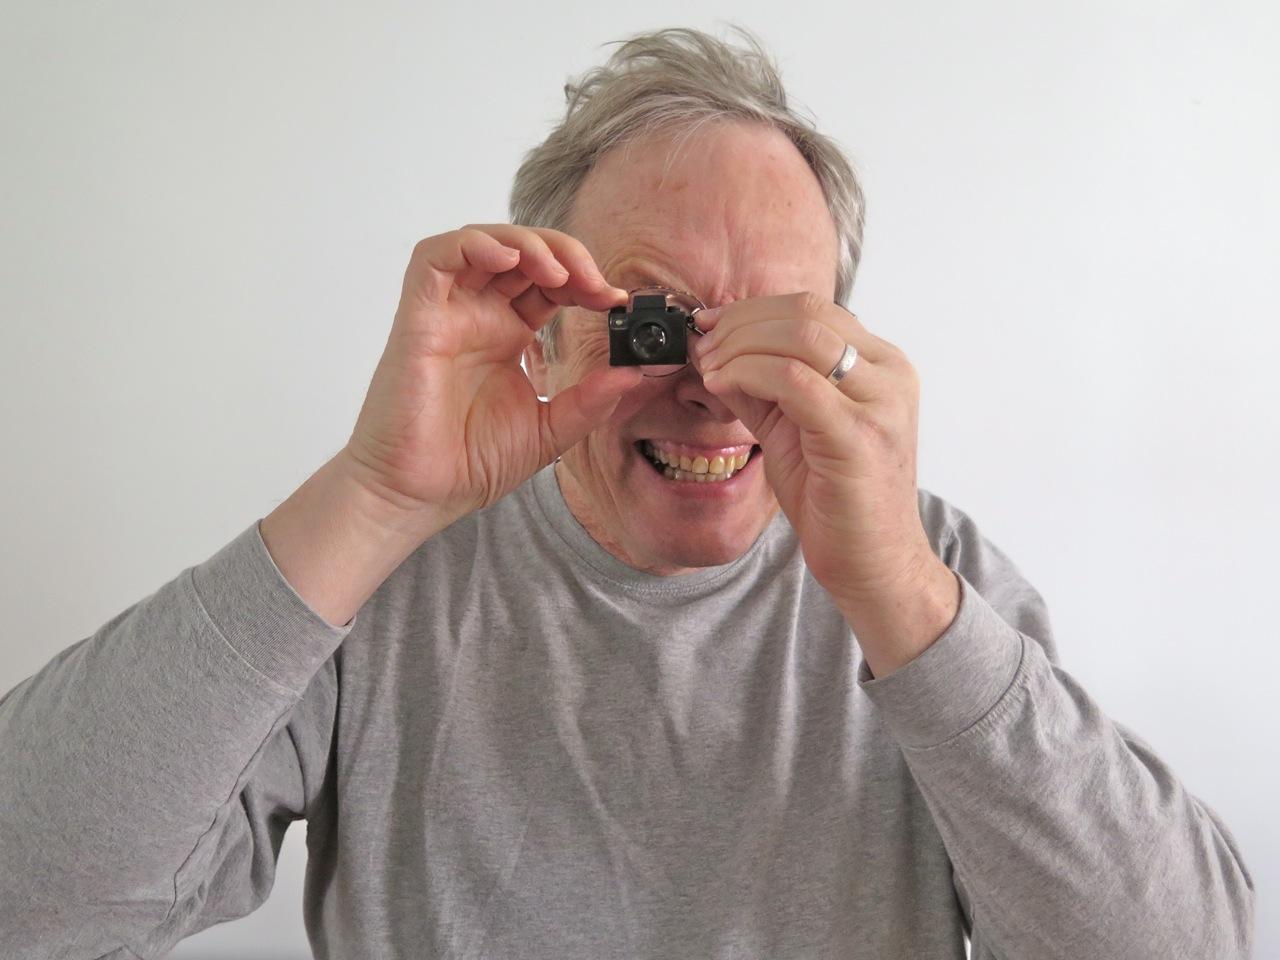 IMG_0500 Mike Hazard tiny camera smile_photo by Tressa Sularz.jpg